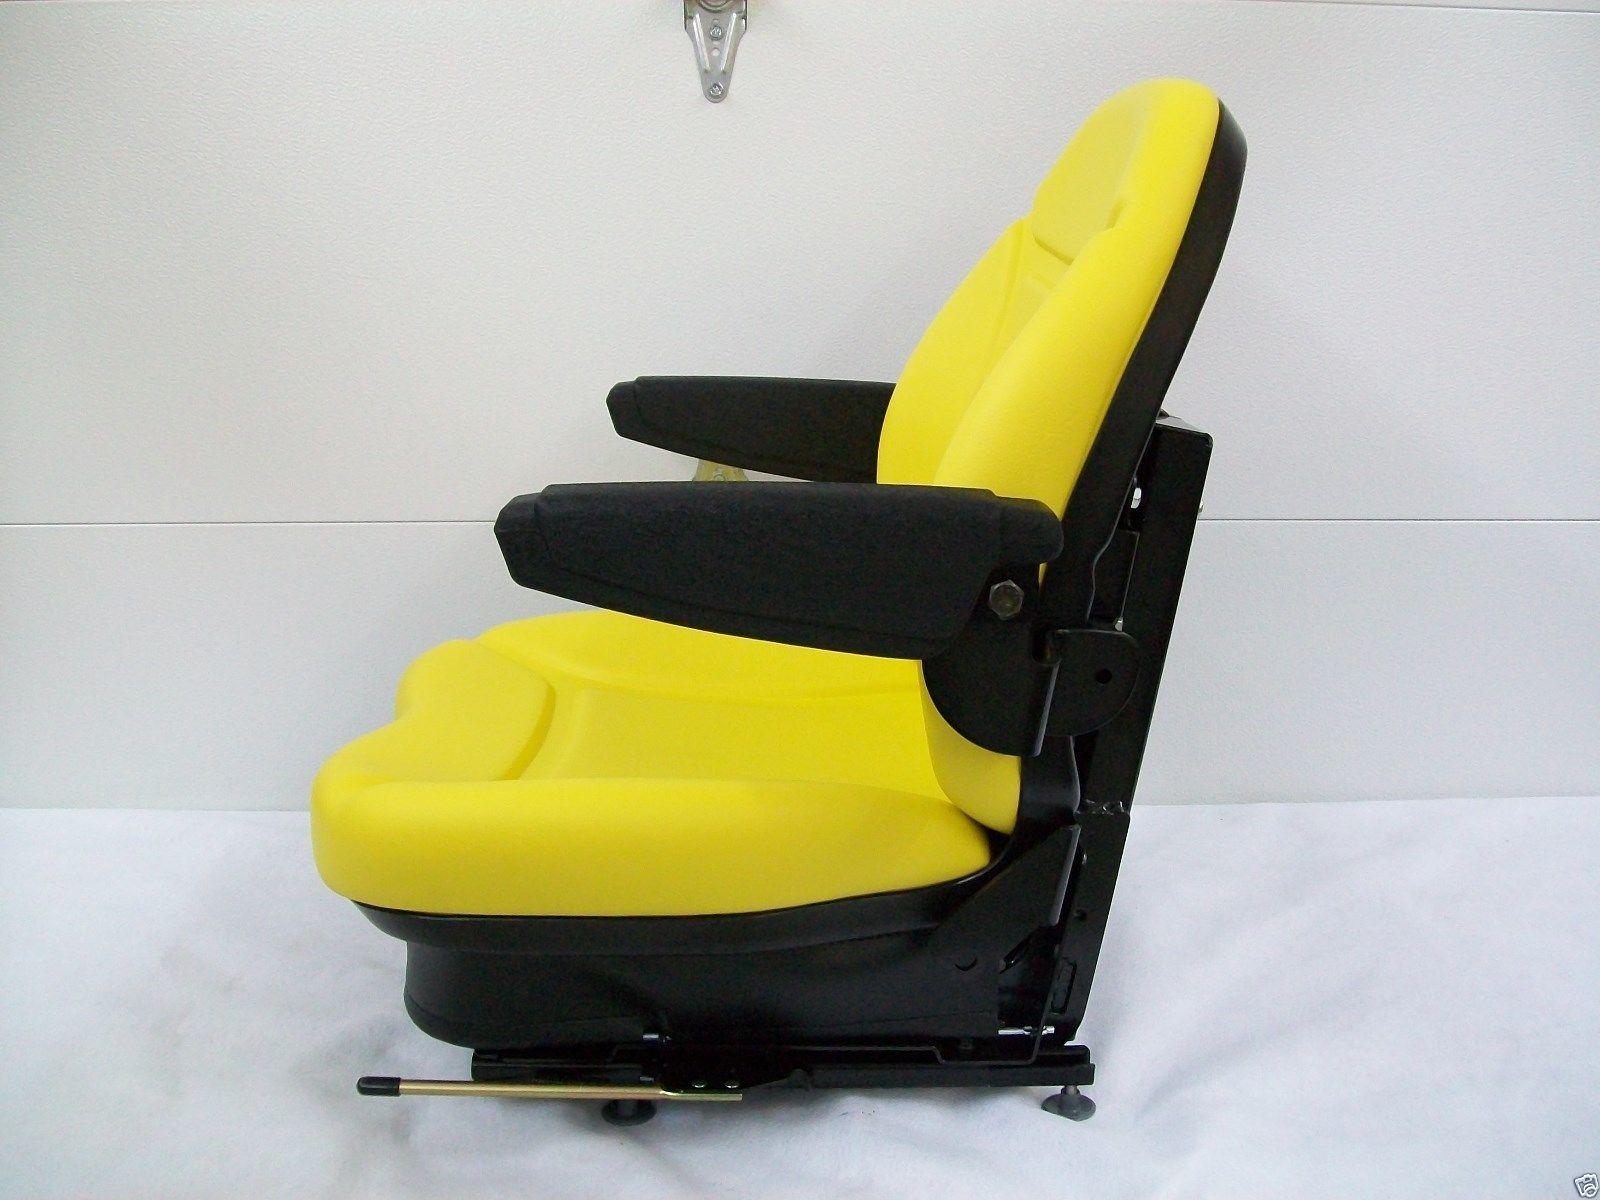 Yellow Suspension Seat Jd John Deere Front Mower Turf